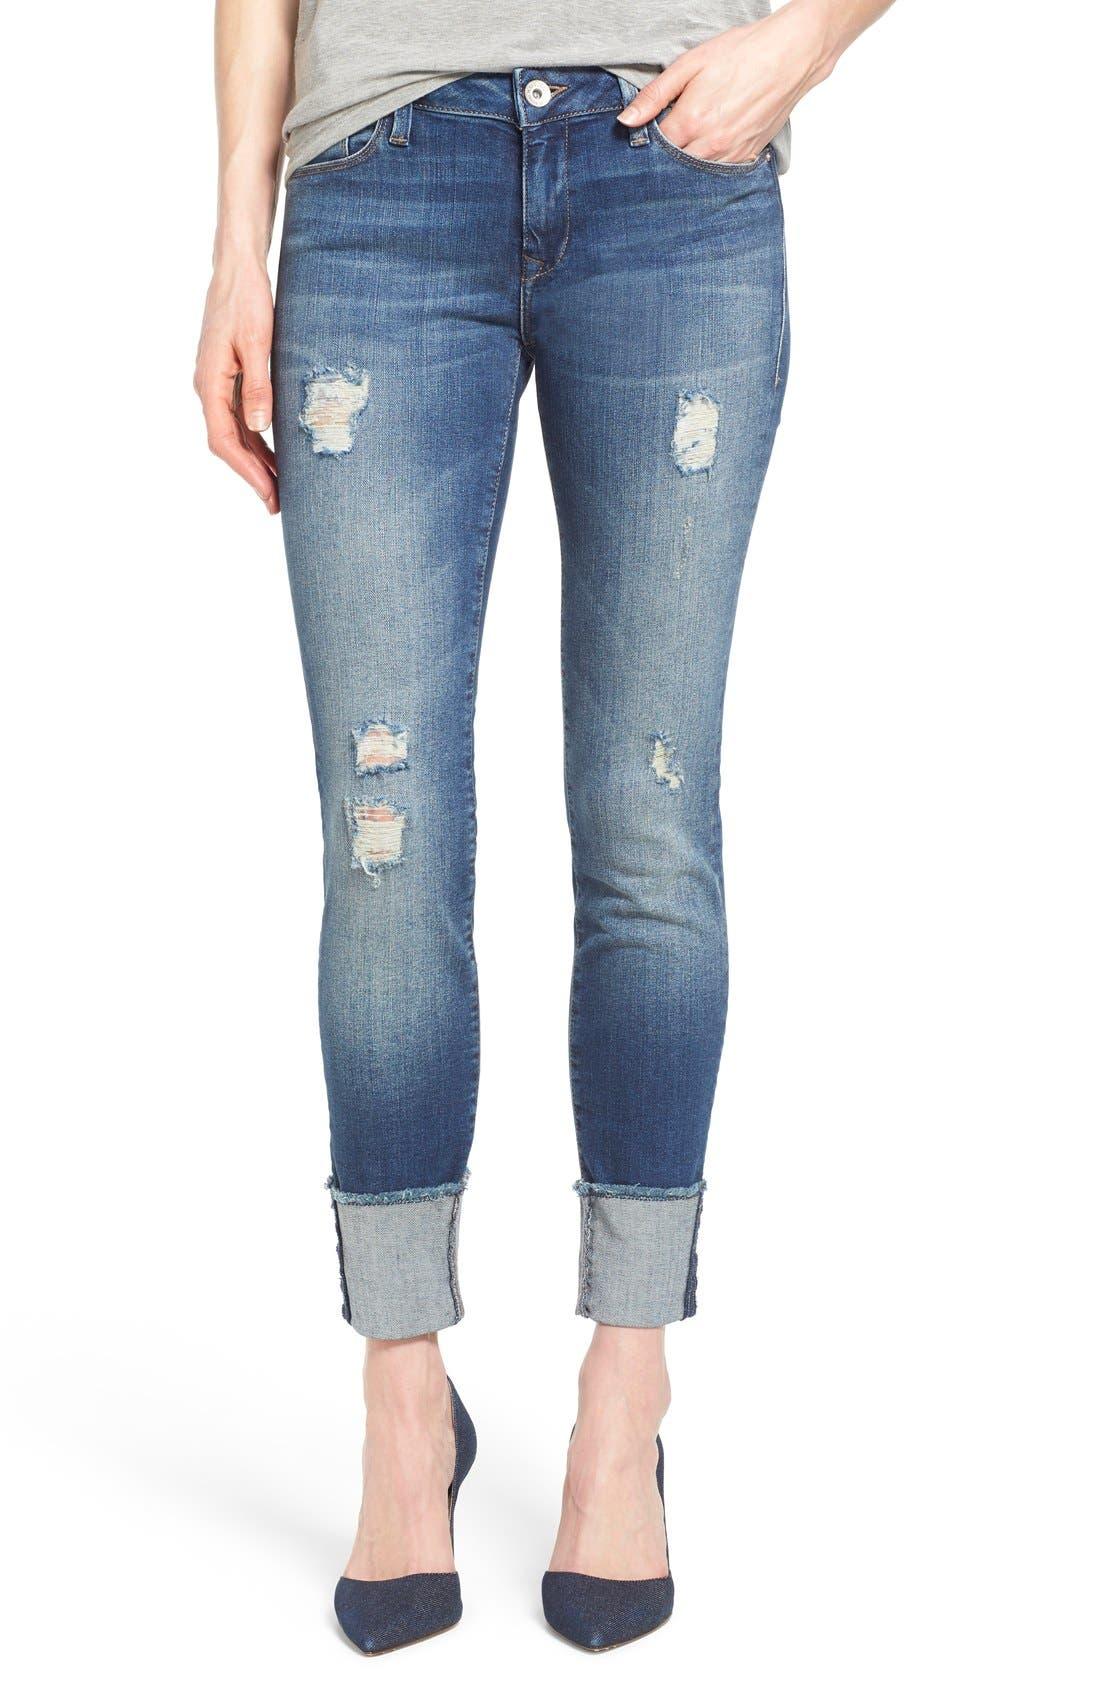 Mavi Jeans 'Erica' Ripped Cuffed Ankle Jeans